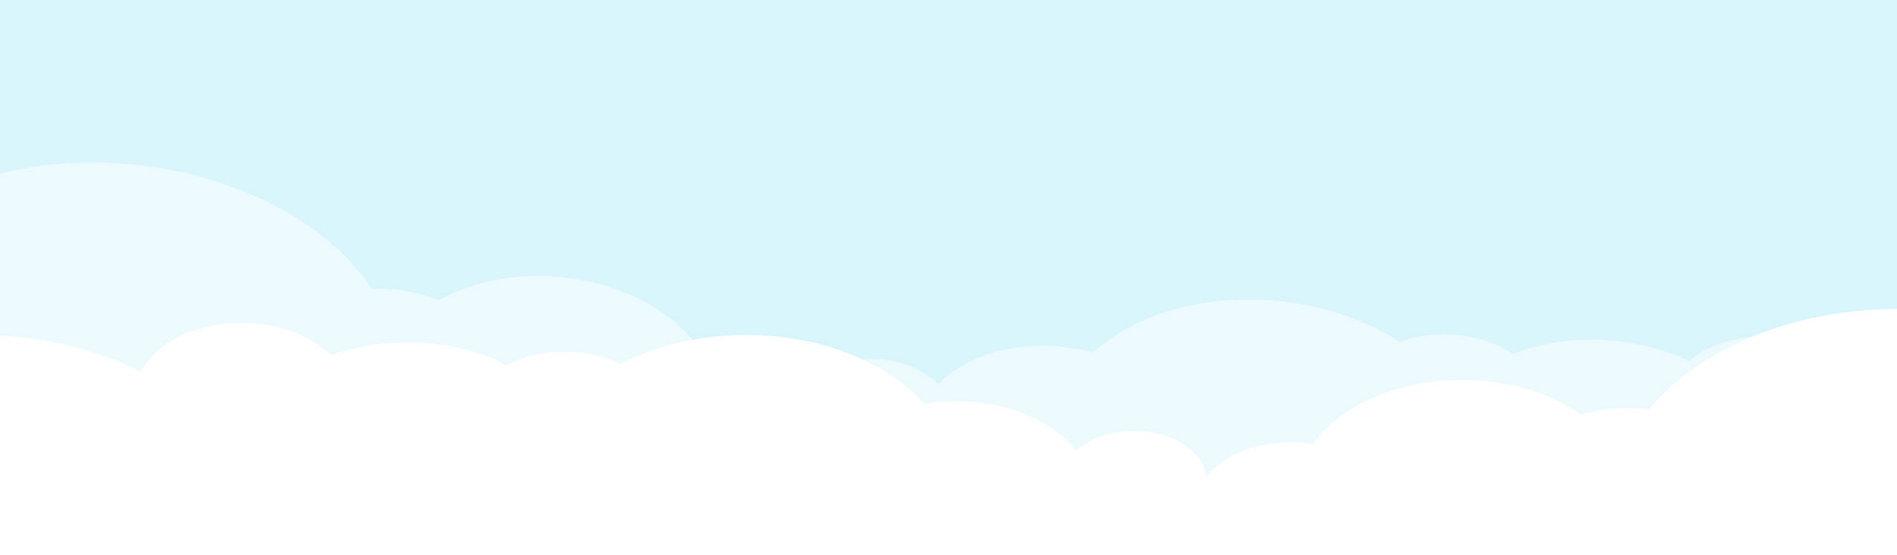 Blue-Castle-Cloud-Background.jpg